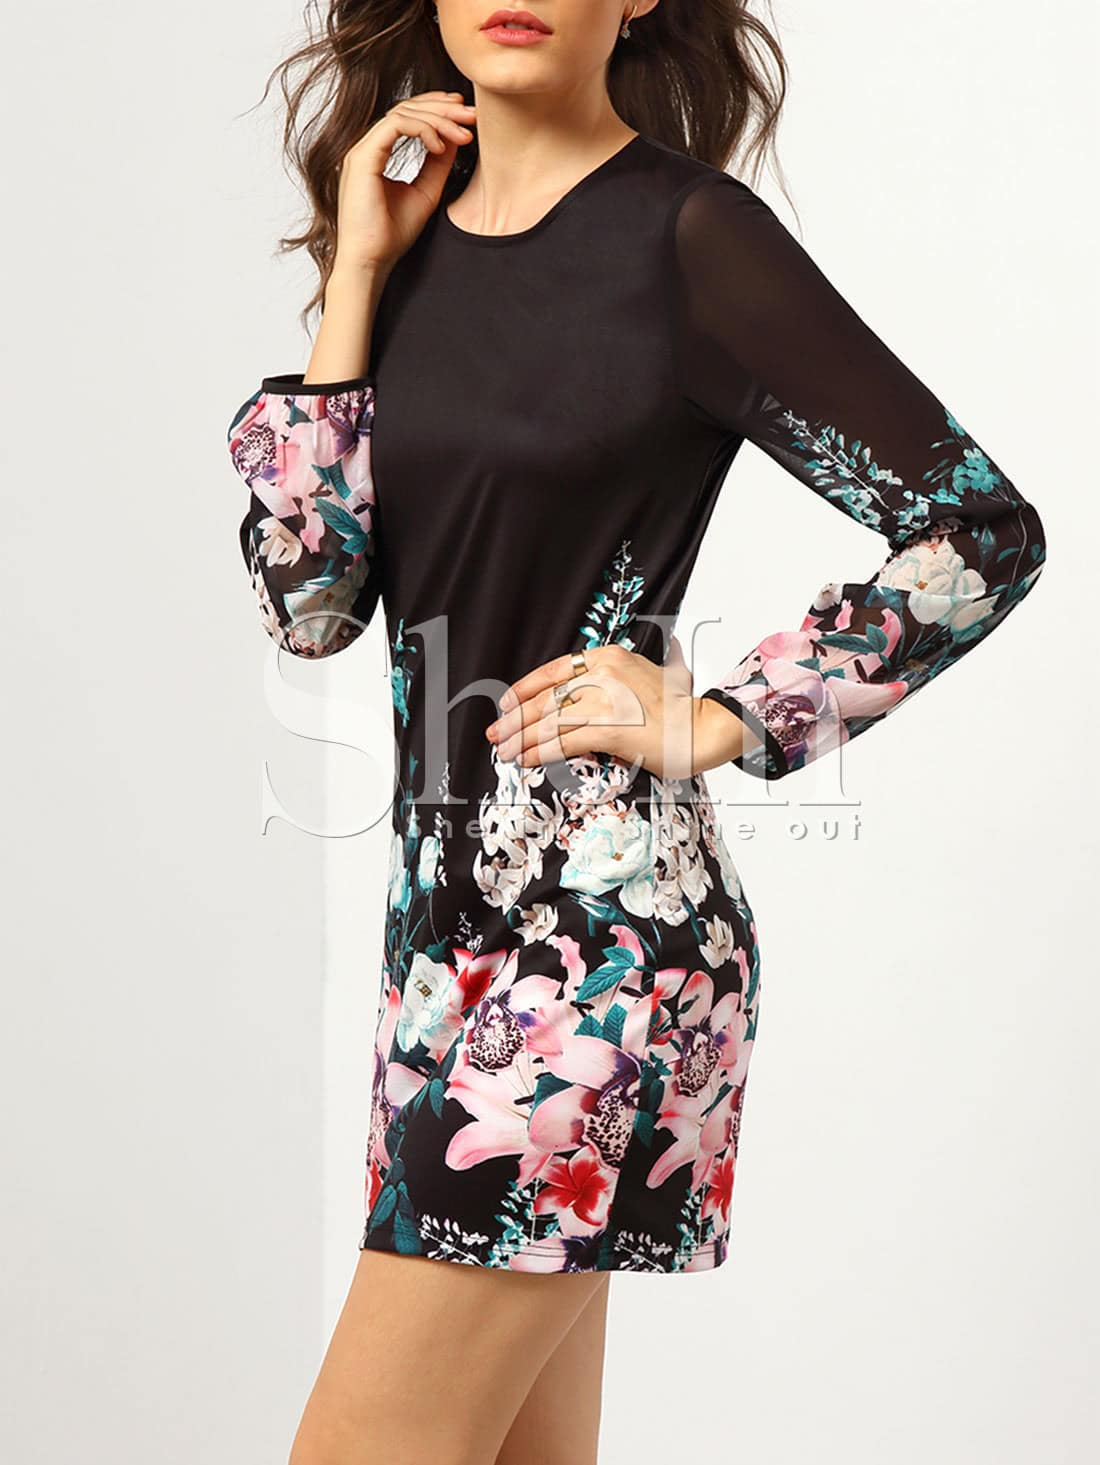 Black Long Sleeve Floral DressBlack Long Sleeve Floral Dress<br><br>color: Black<br>size: L,M,S,XL,XXL